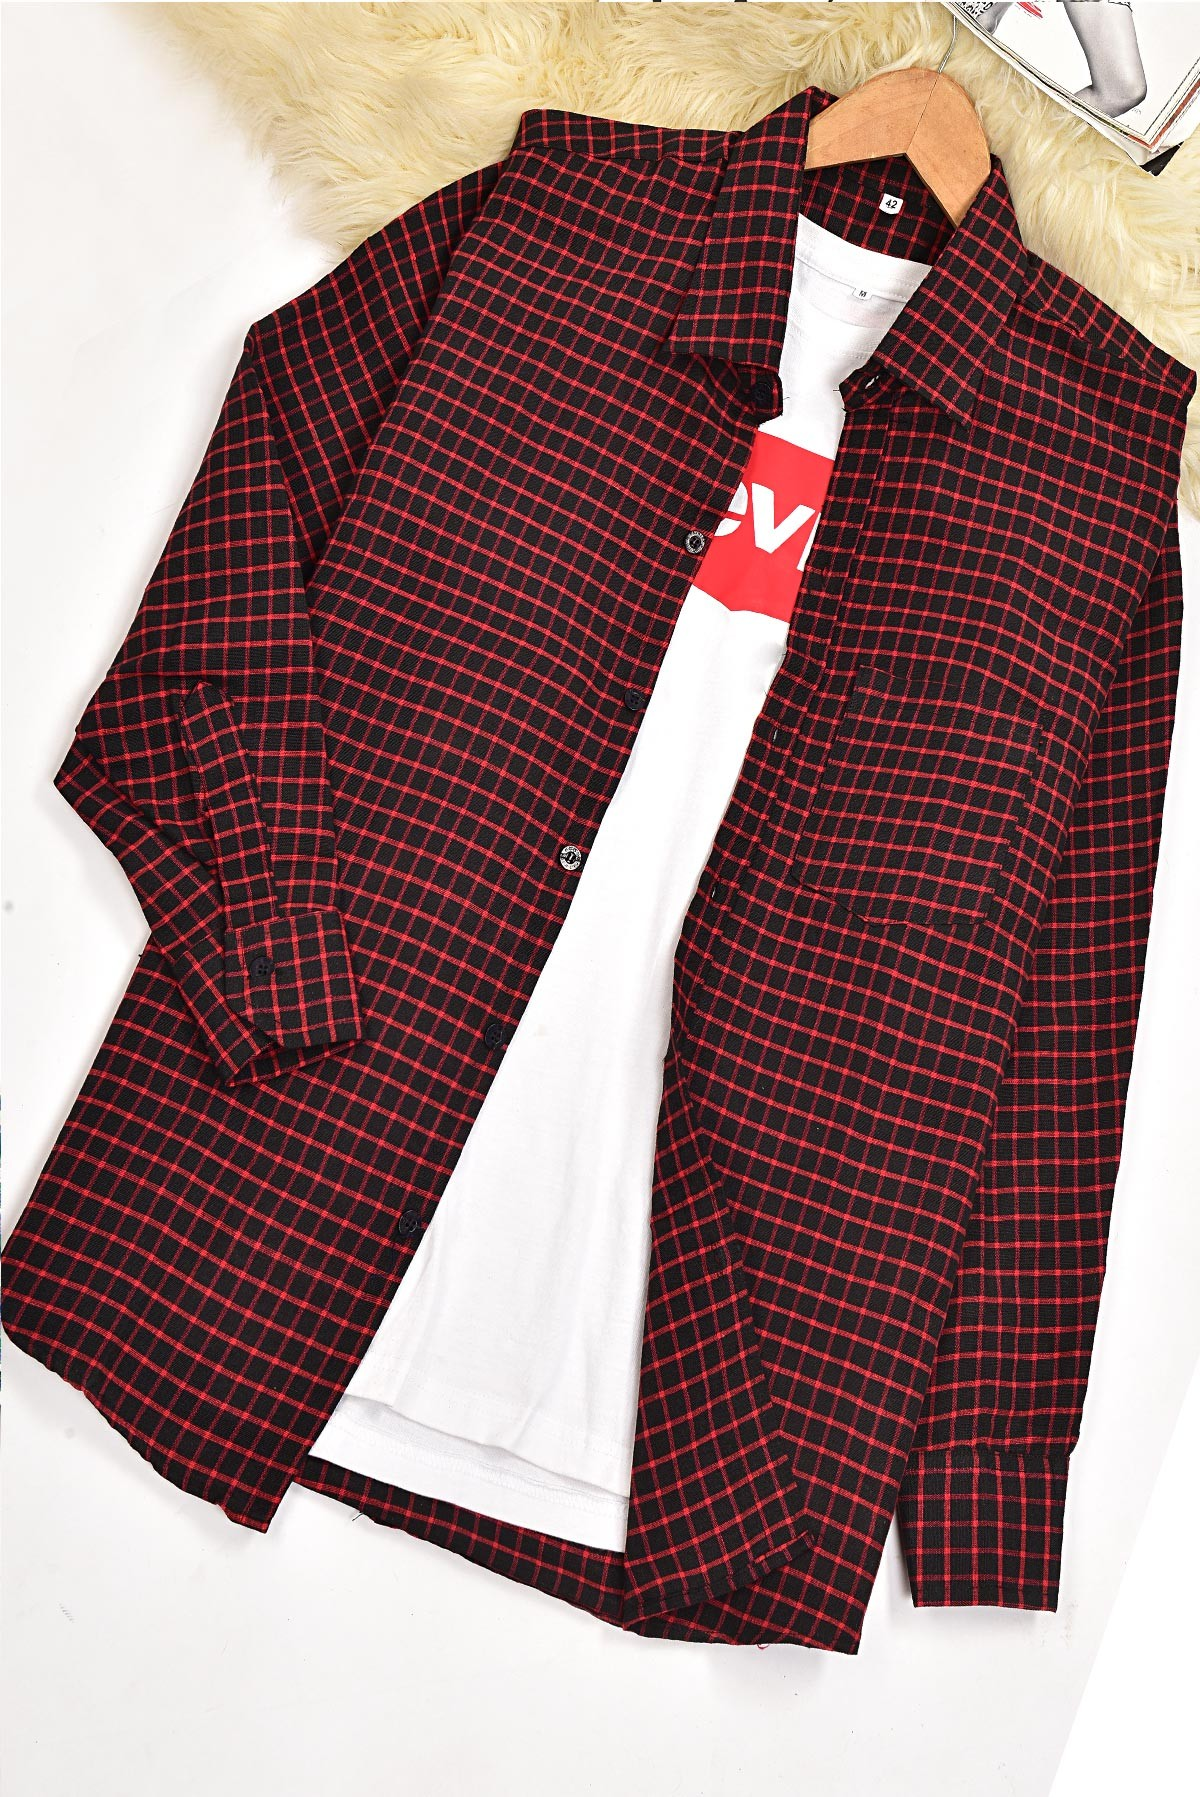 Men's Basic Full Sleeves Red and Black Check Shirt S158